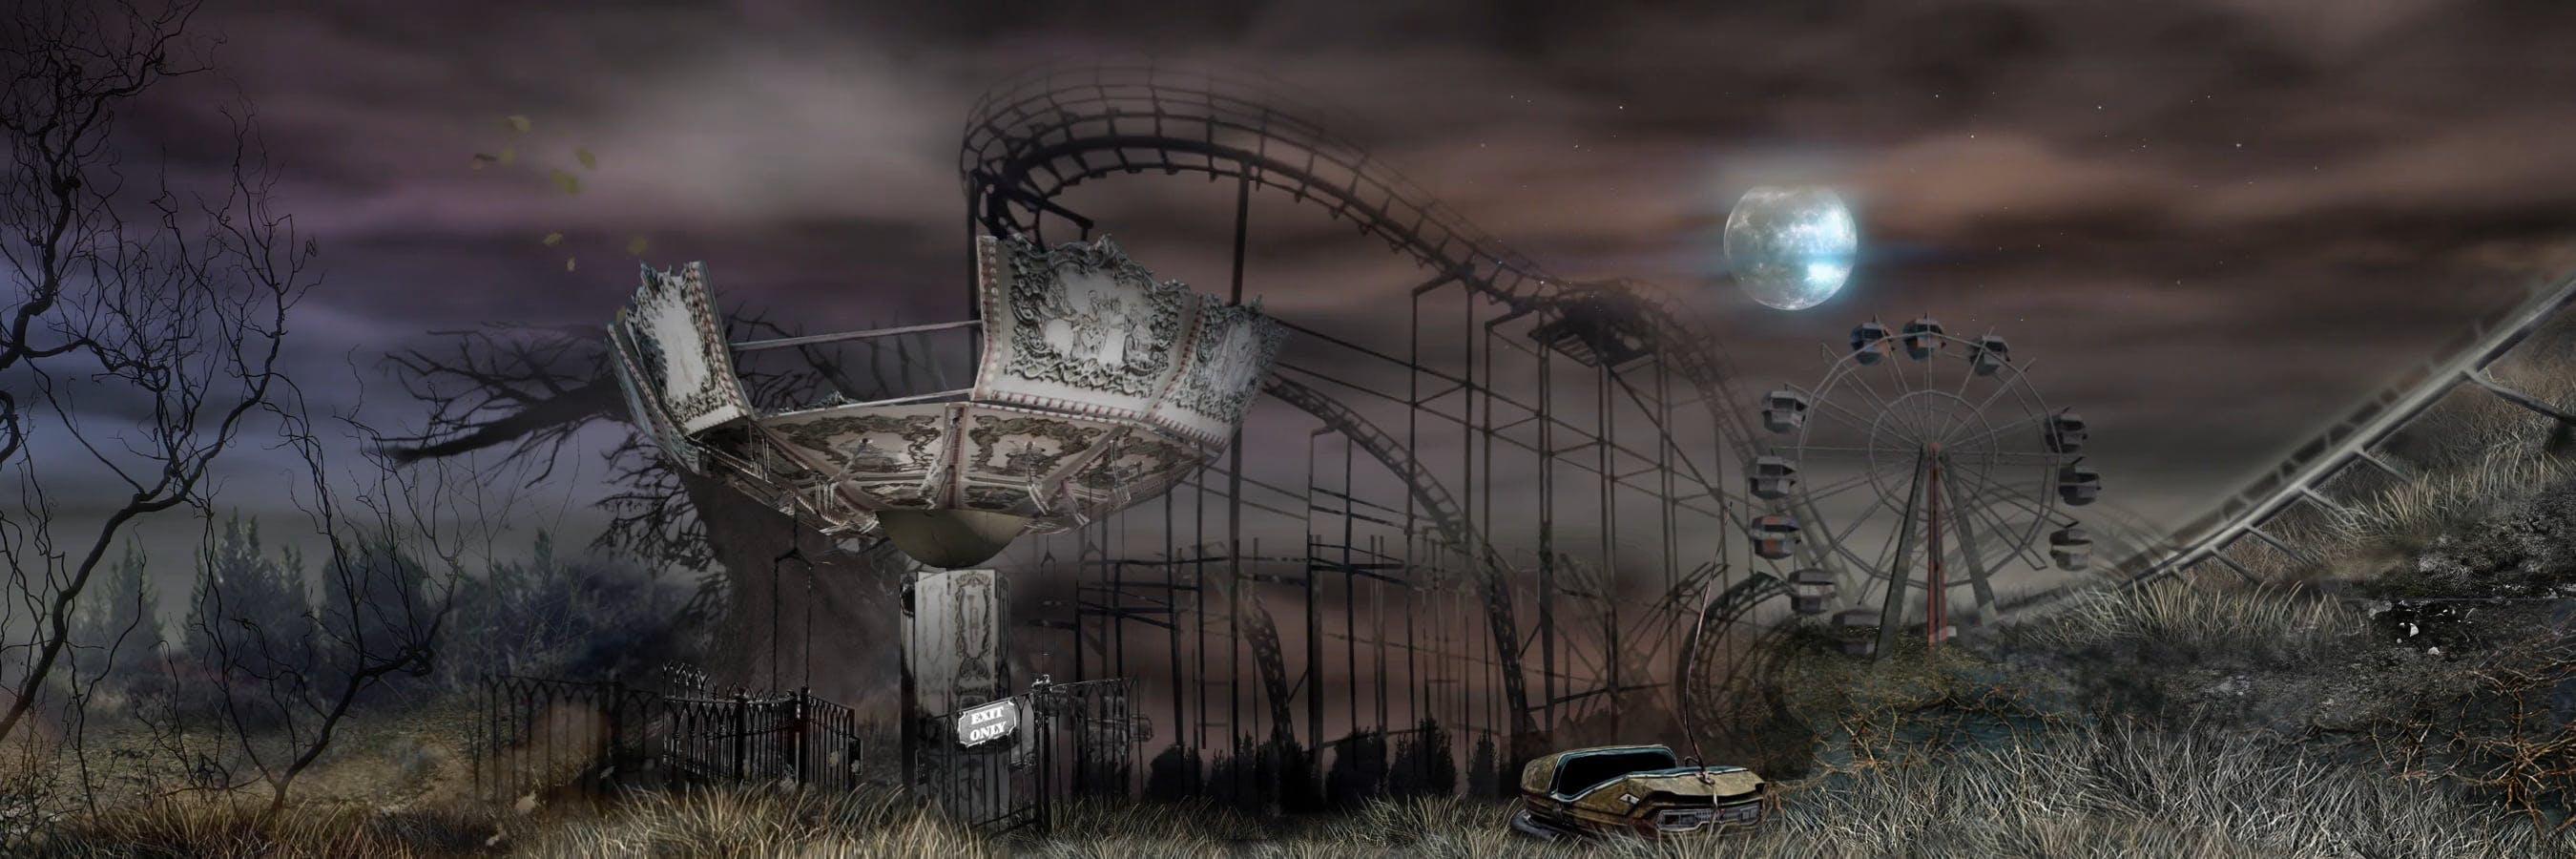 Abandoned Park